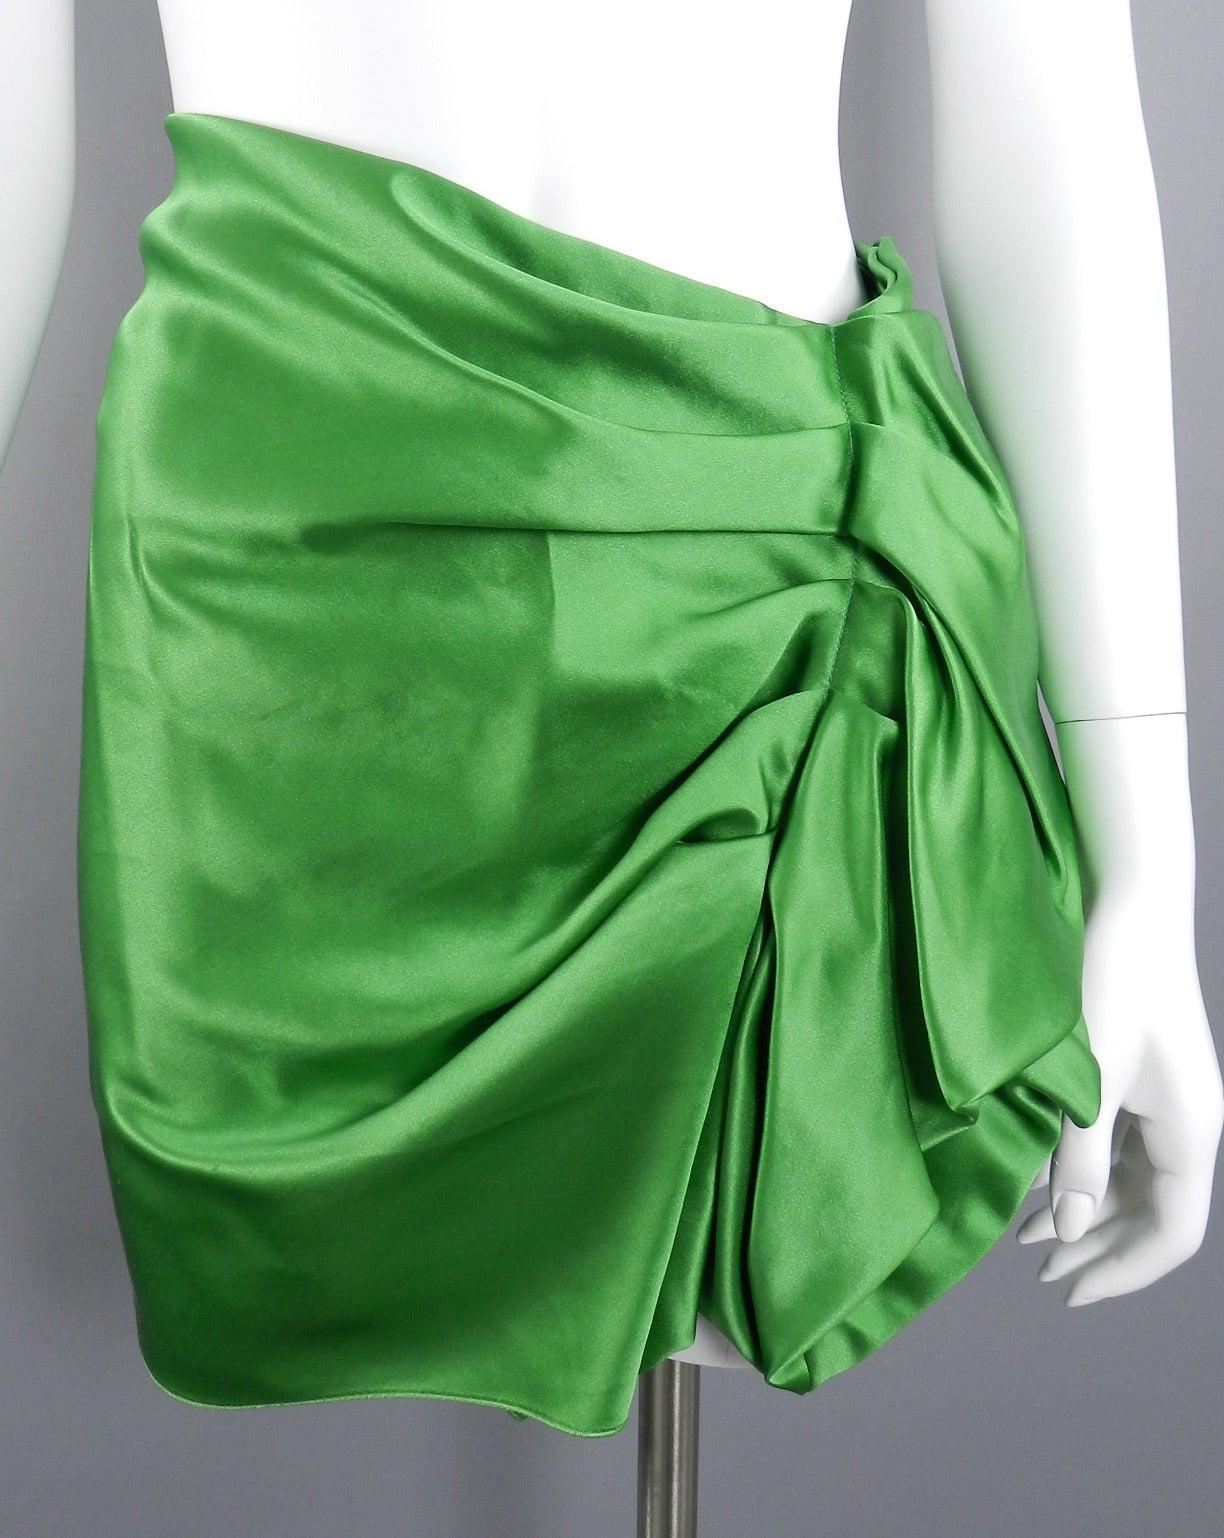 Lanvin 2009 Spring Runway Green Silk skirt 3